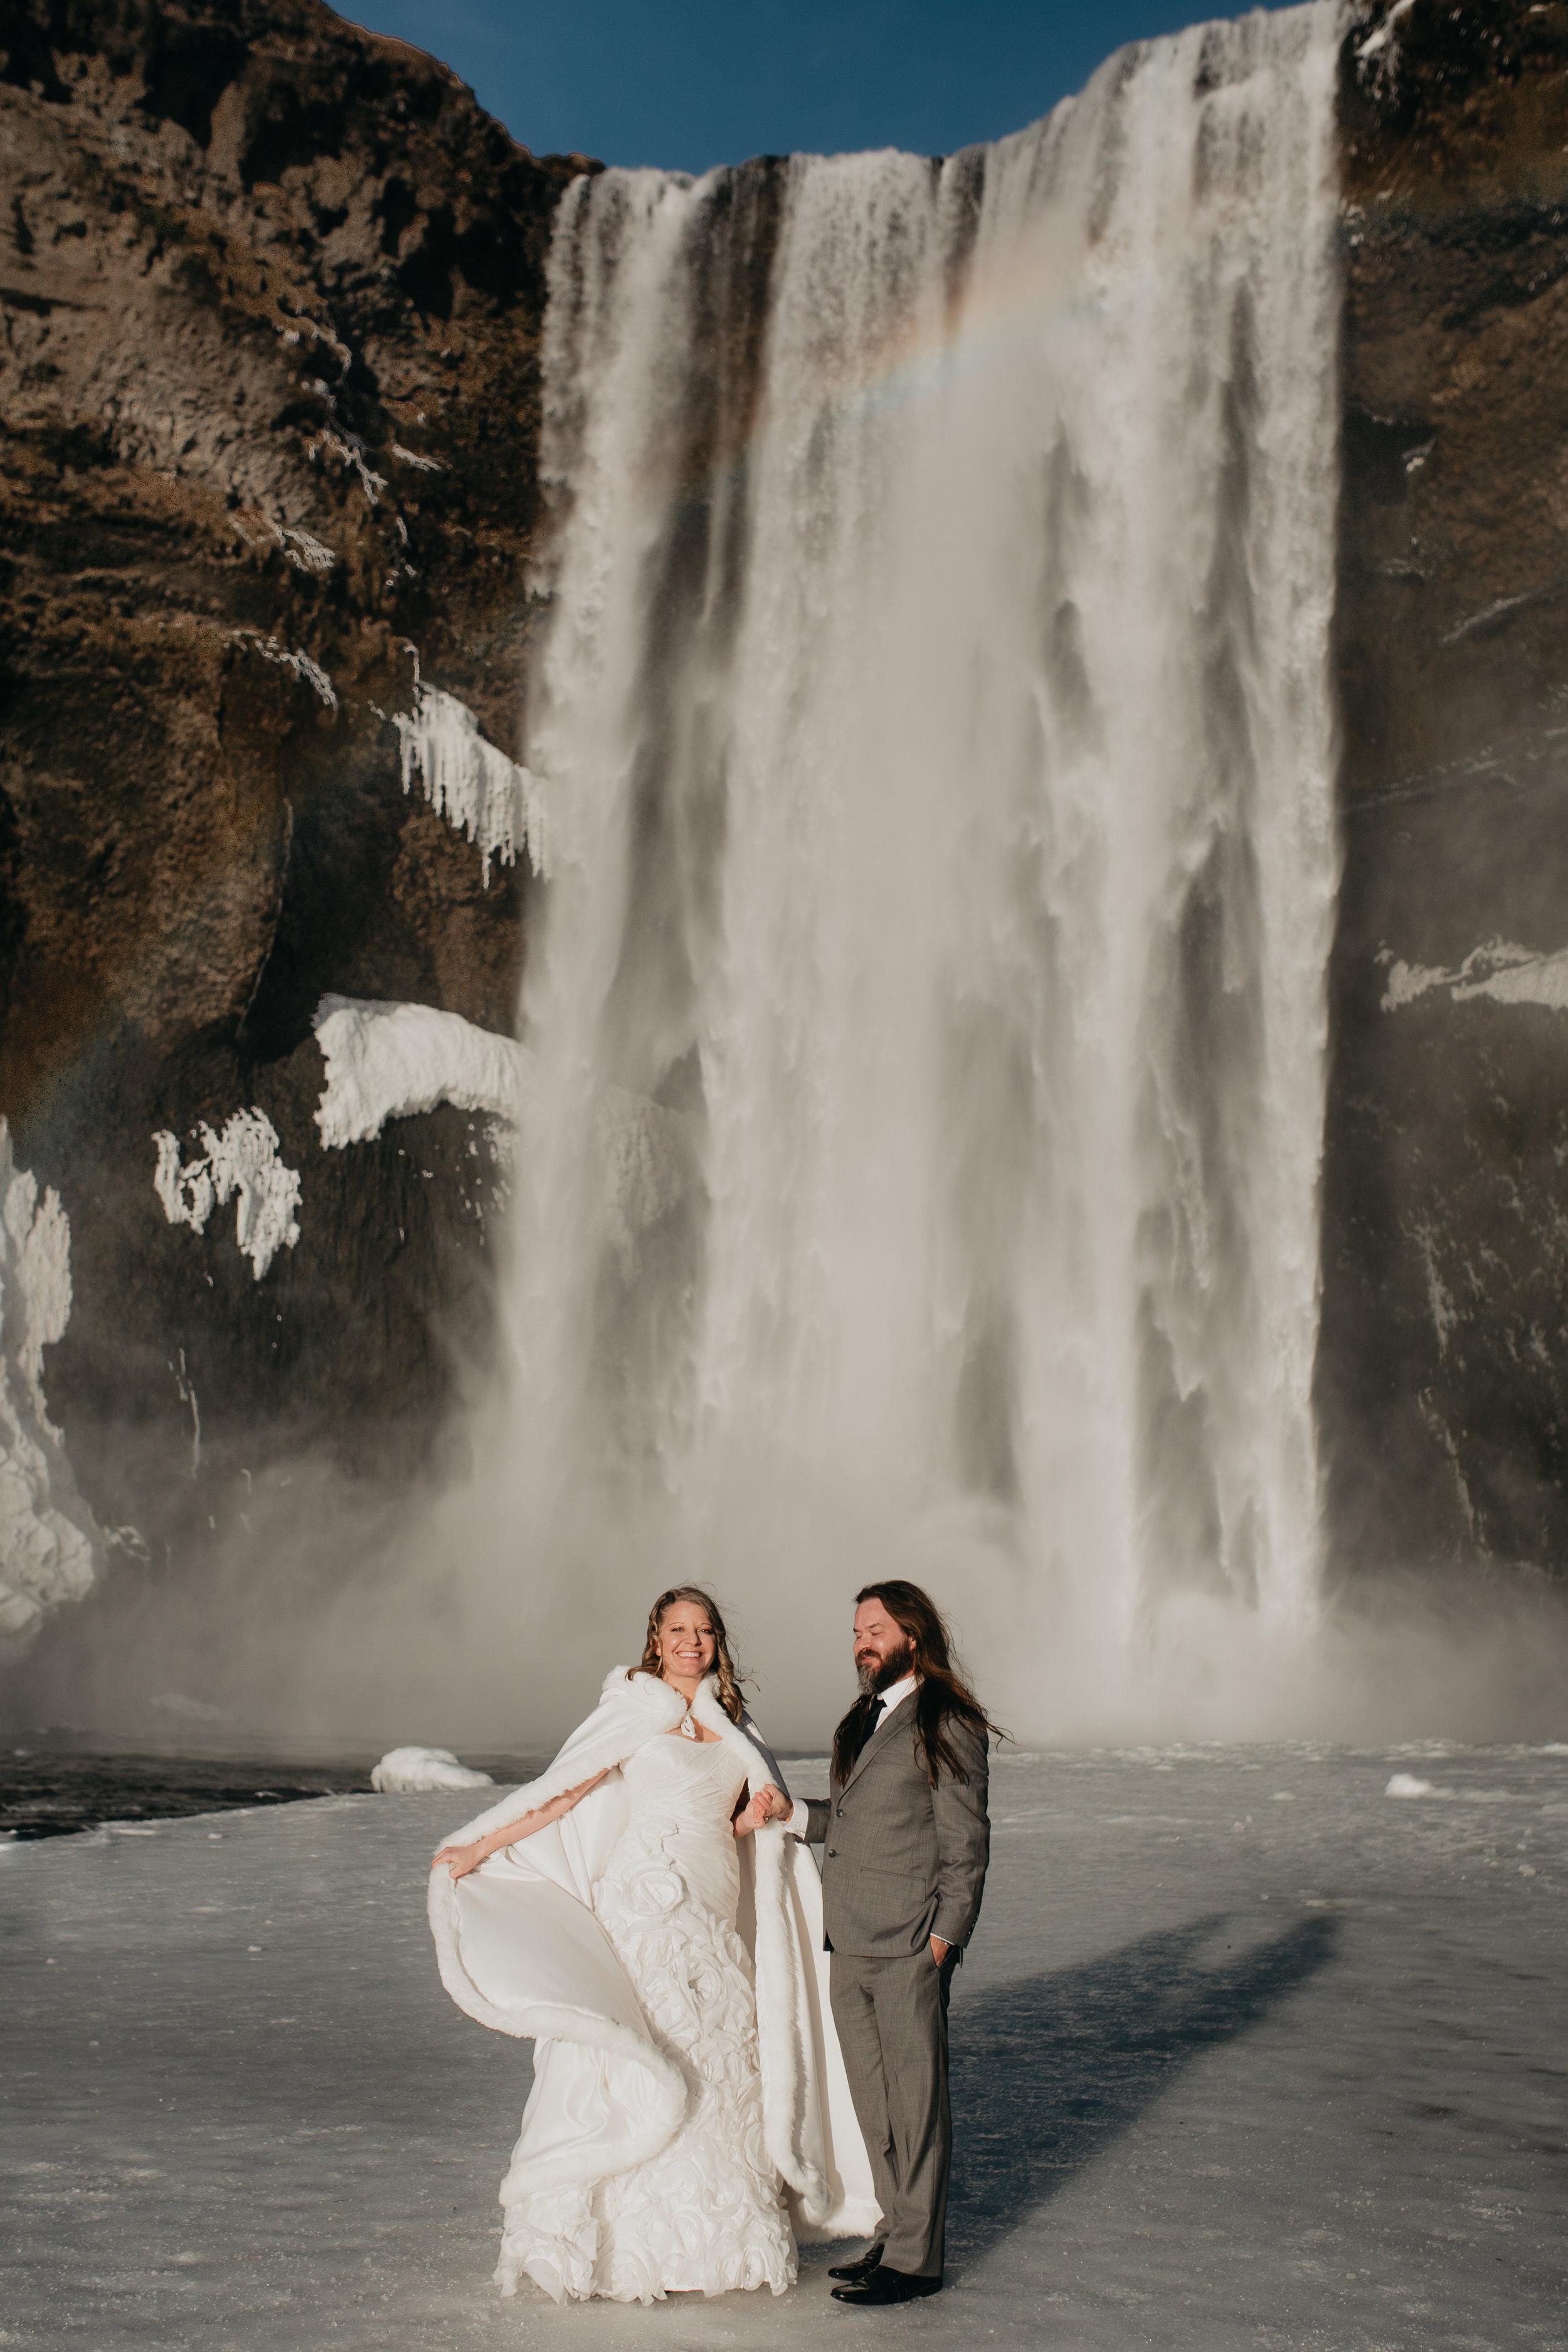 nicole-daacke-photography-iceland-winter-sunset-adventure-elopement-skogafoss-waterfall-black-sand-beach-dyrholaey-vik-iceland-intimate-wedding-black-church-elopement-photographer-8.jpg